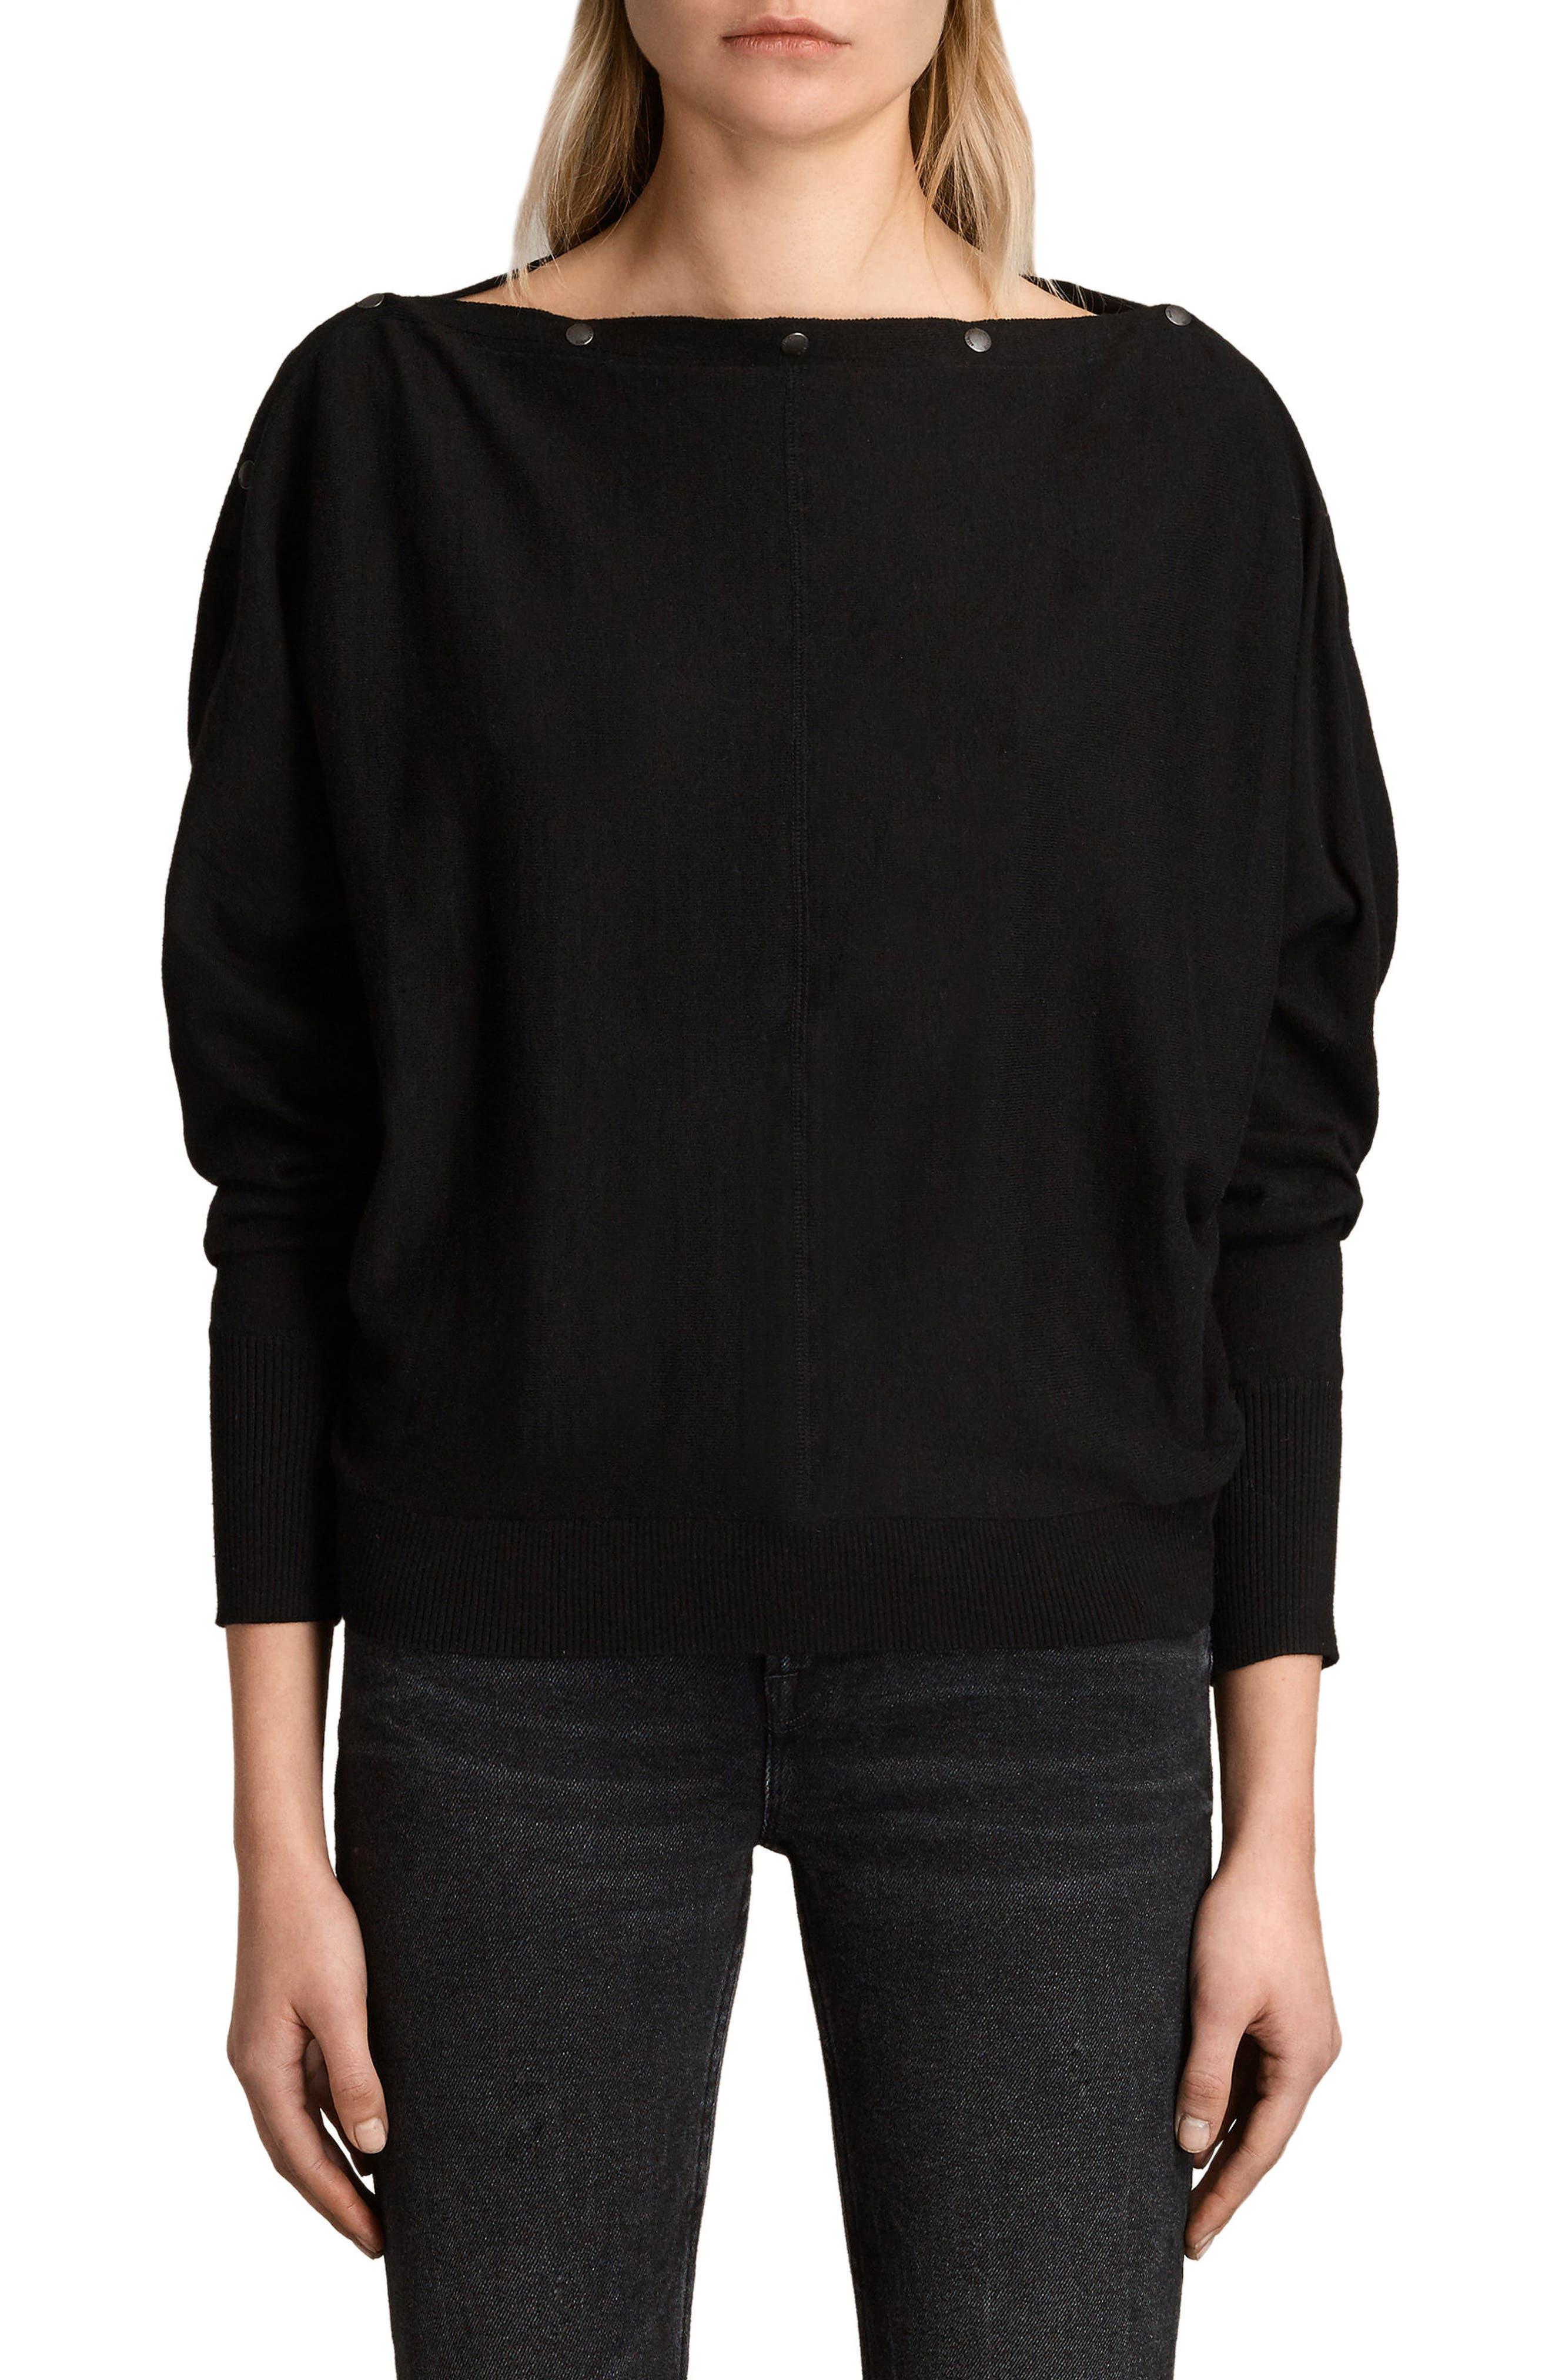 Elle Sweater,                         Main,                         color, Black